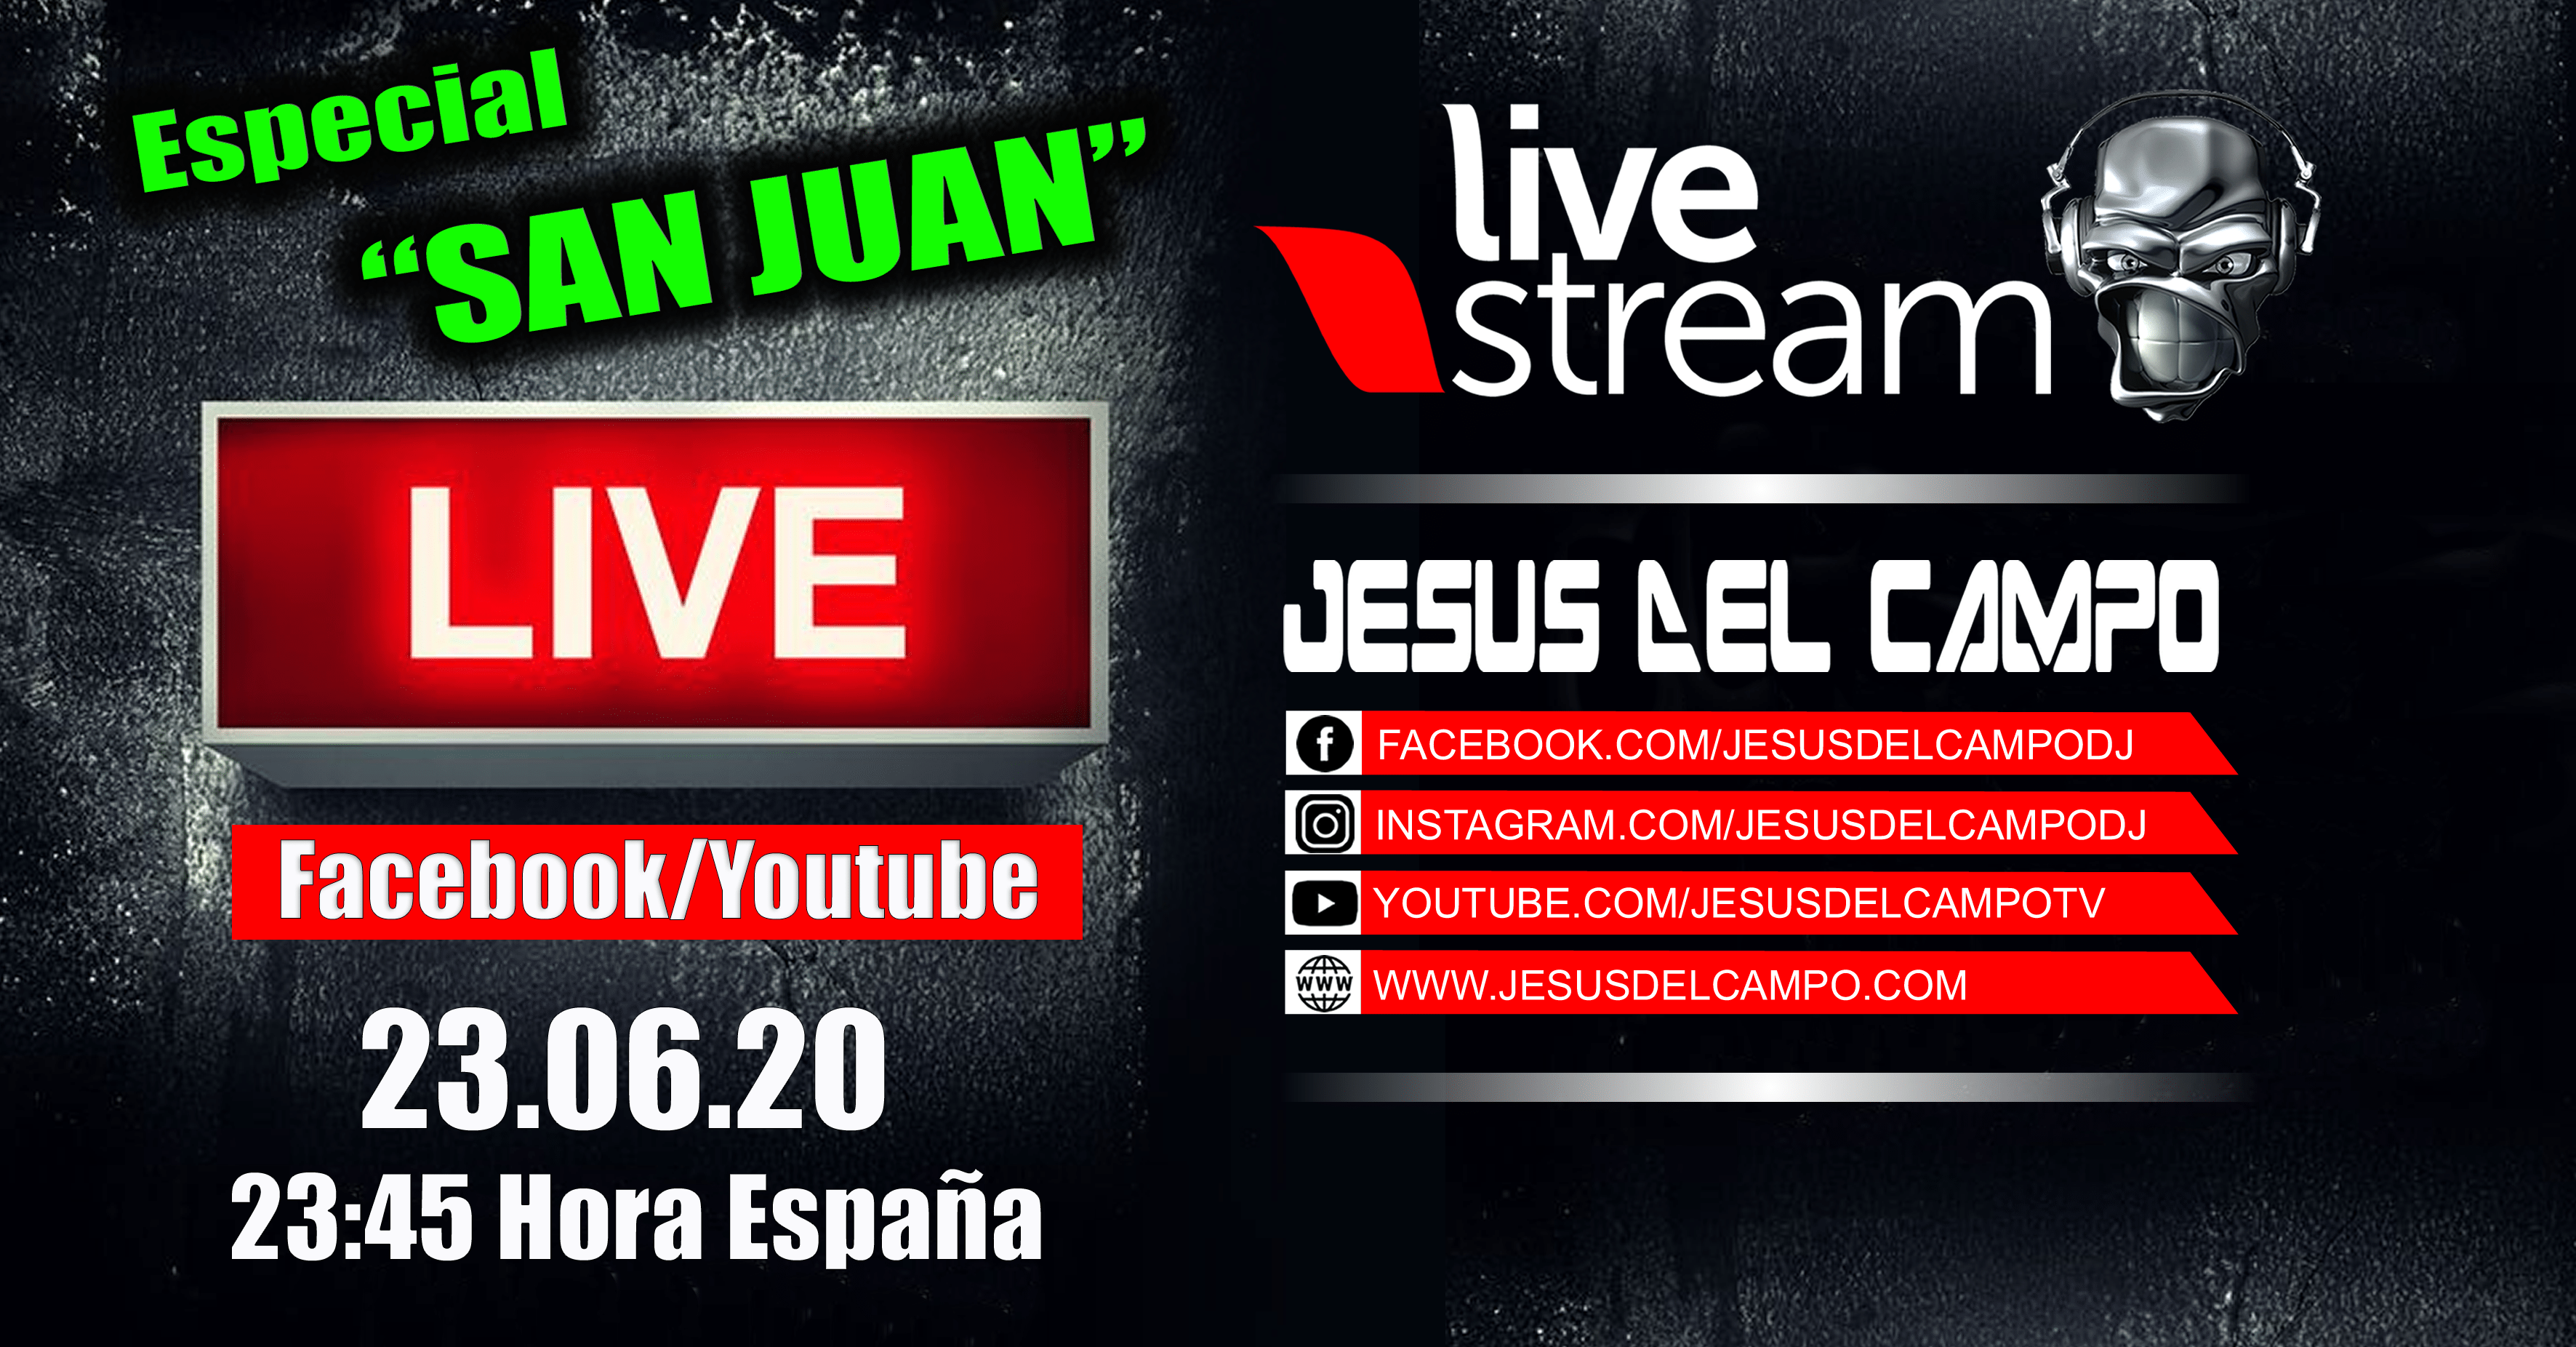 flyer Live Stream San Juan 23 jun 2020 facebook Youtube jesus del campo